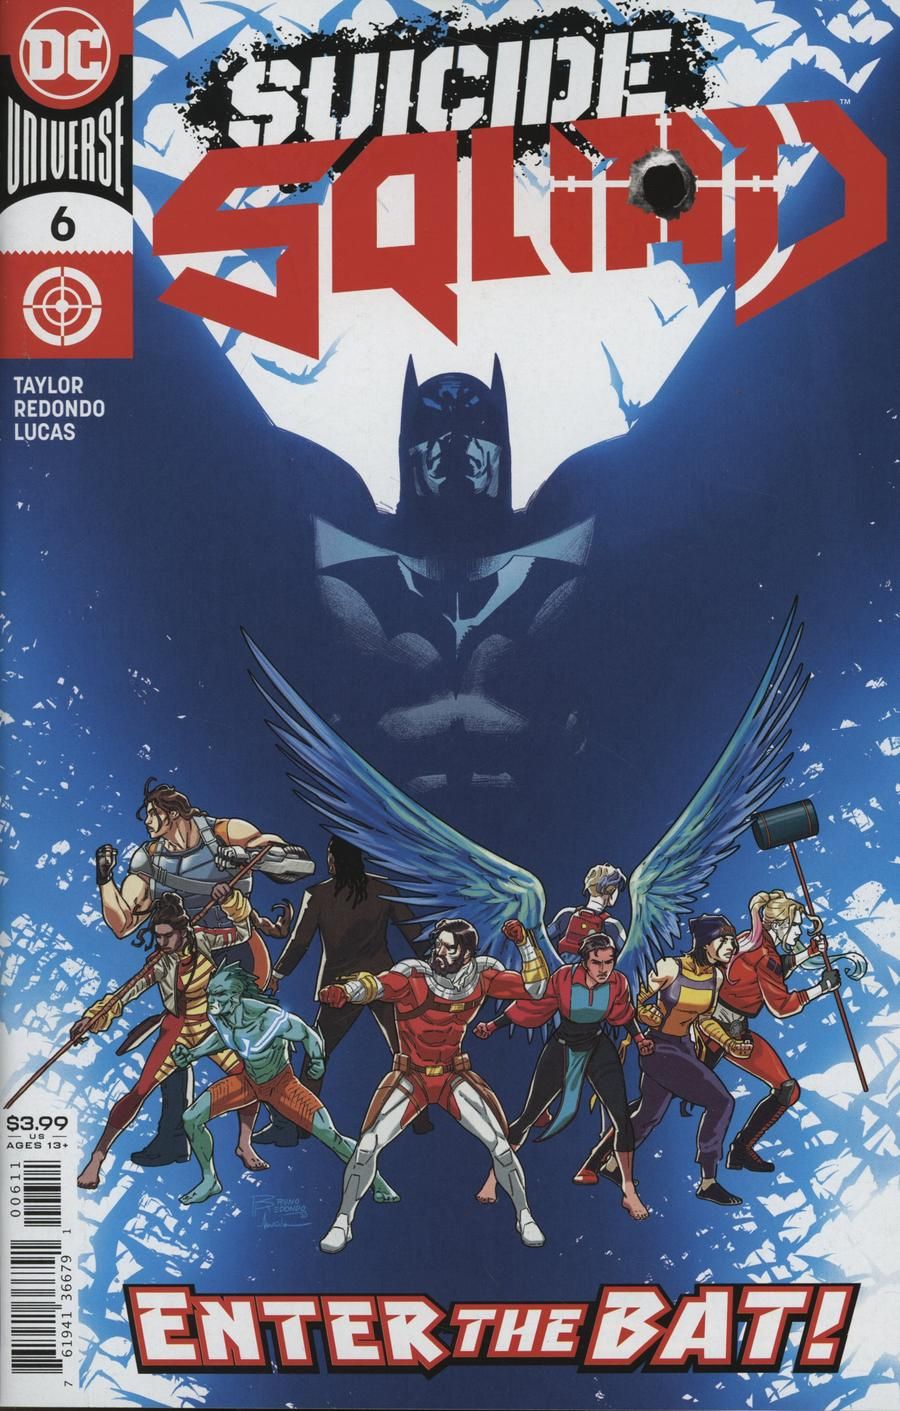 Suicide Squad Vol 5 #6 Cover A Regular Bruno Redondo Cover